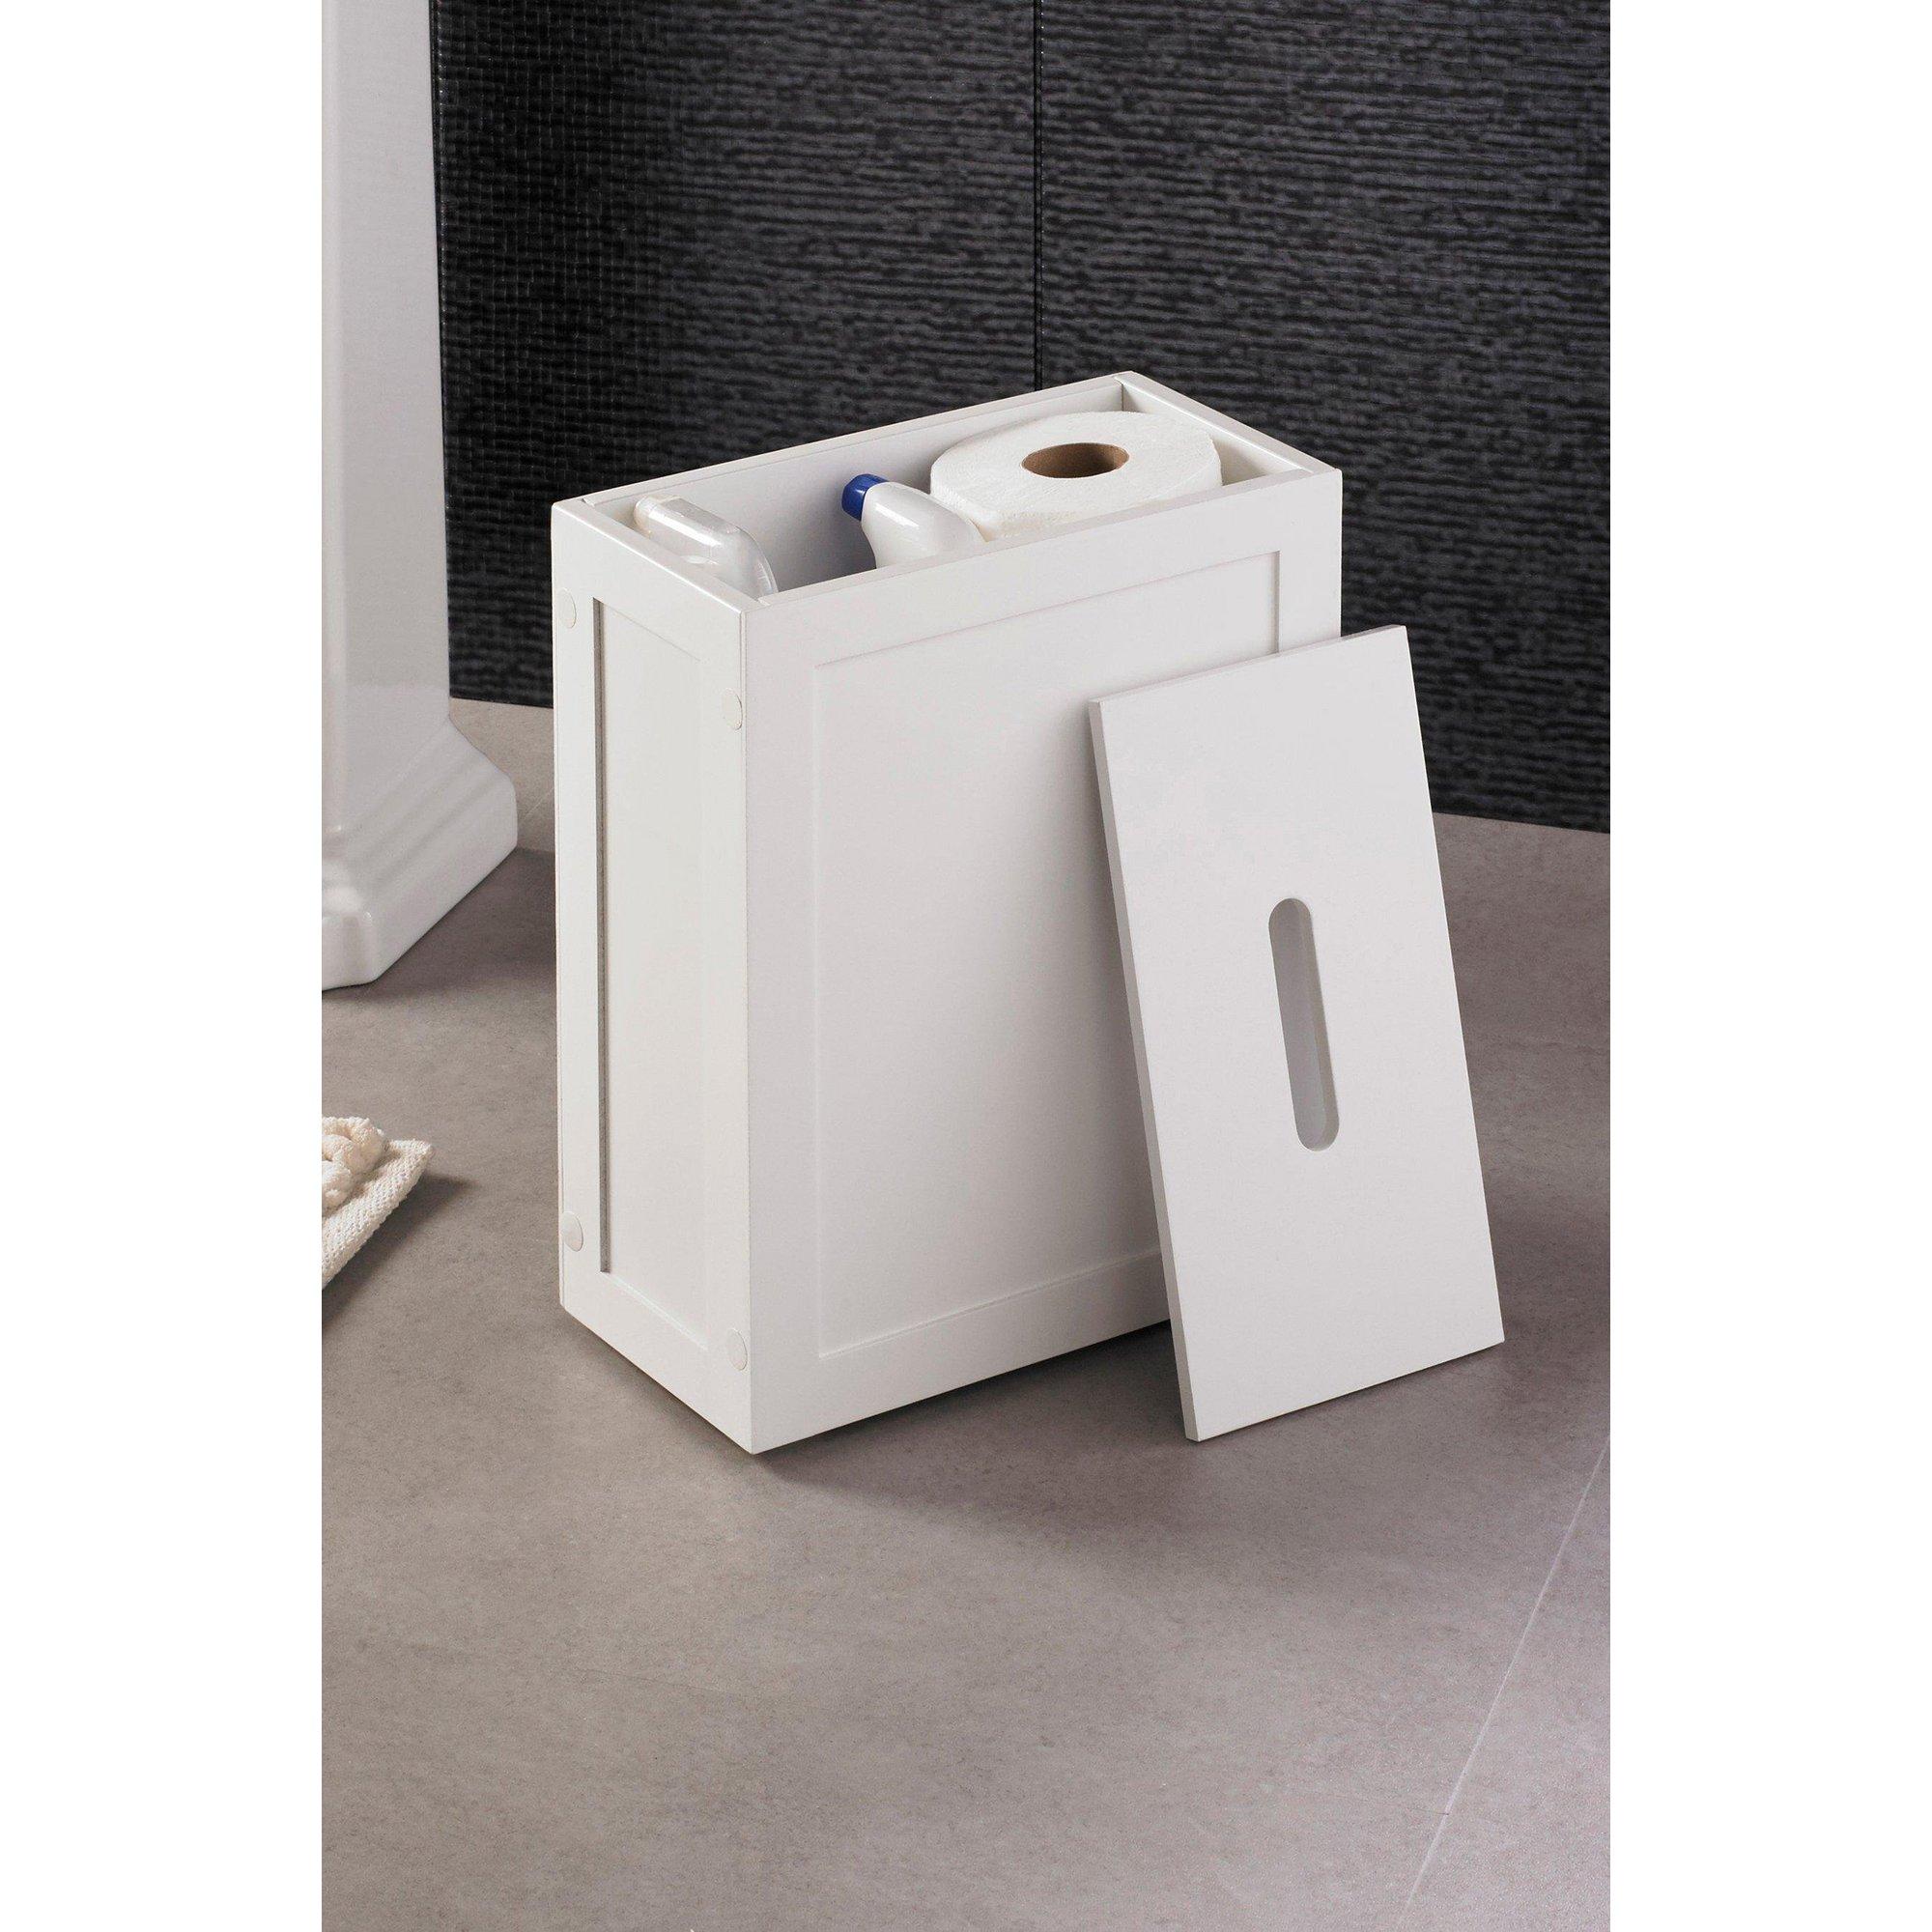 Image of Bathroom Multi-Purpose Caddy